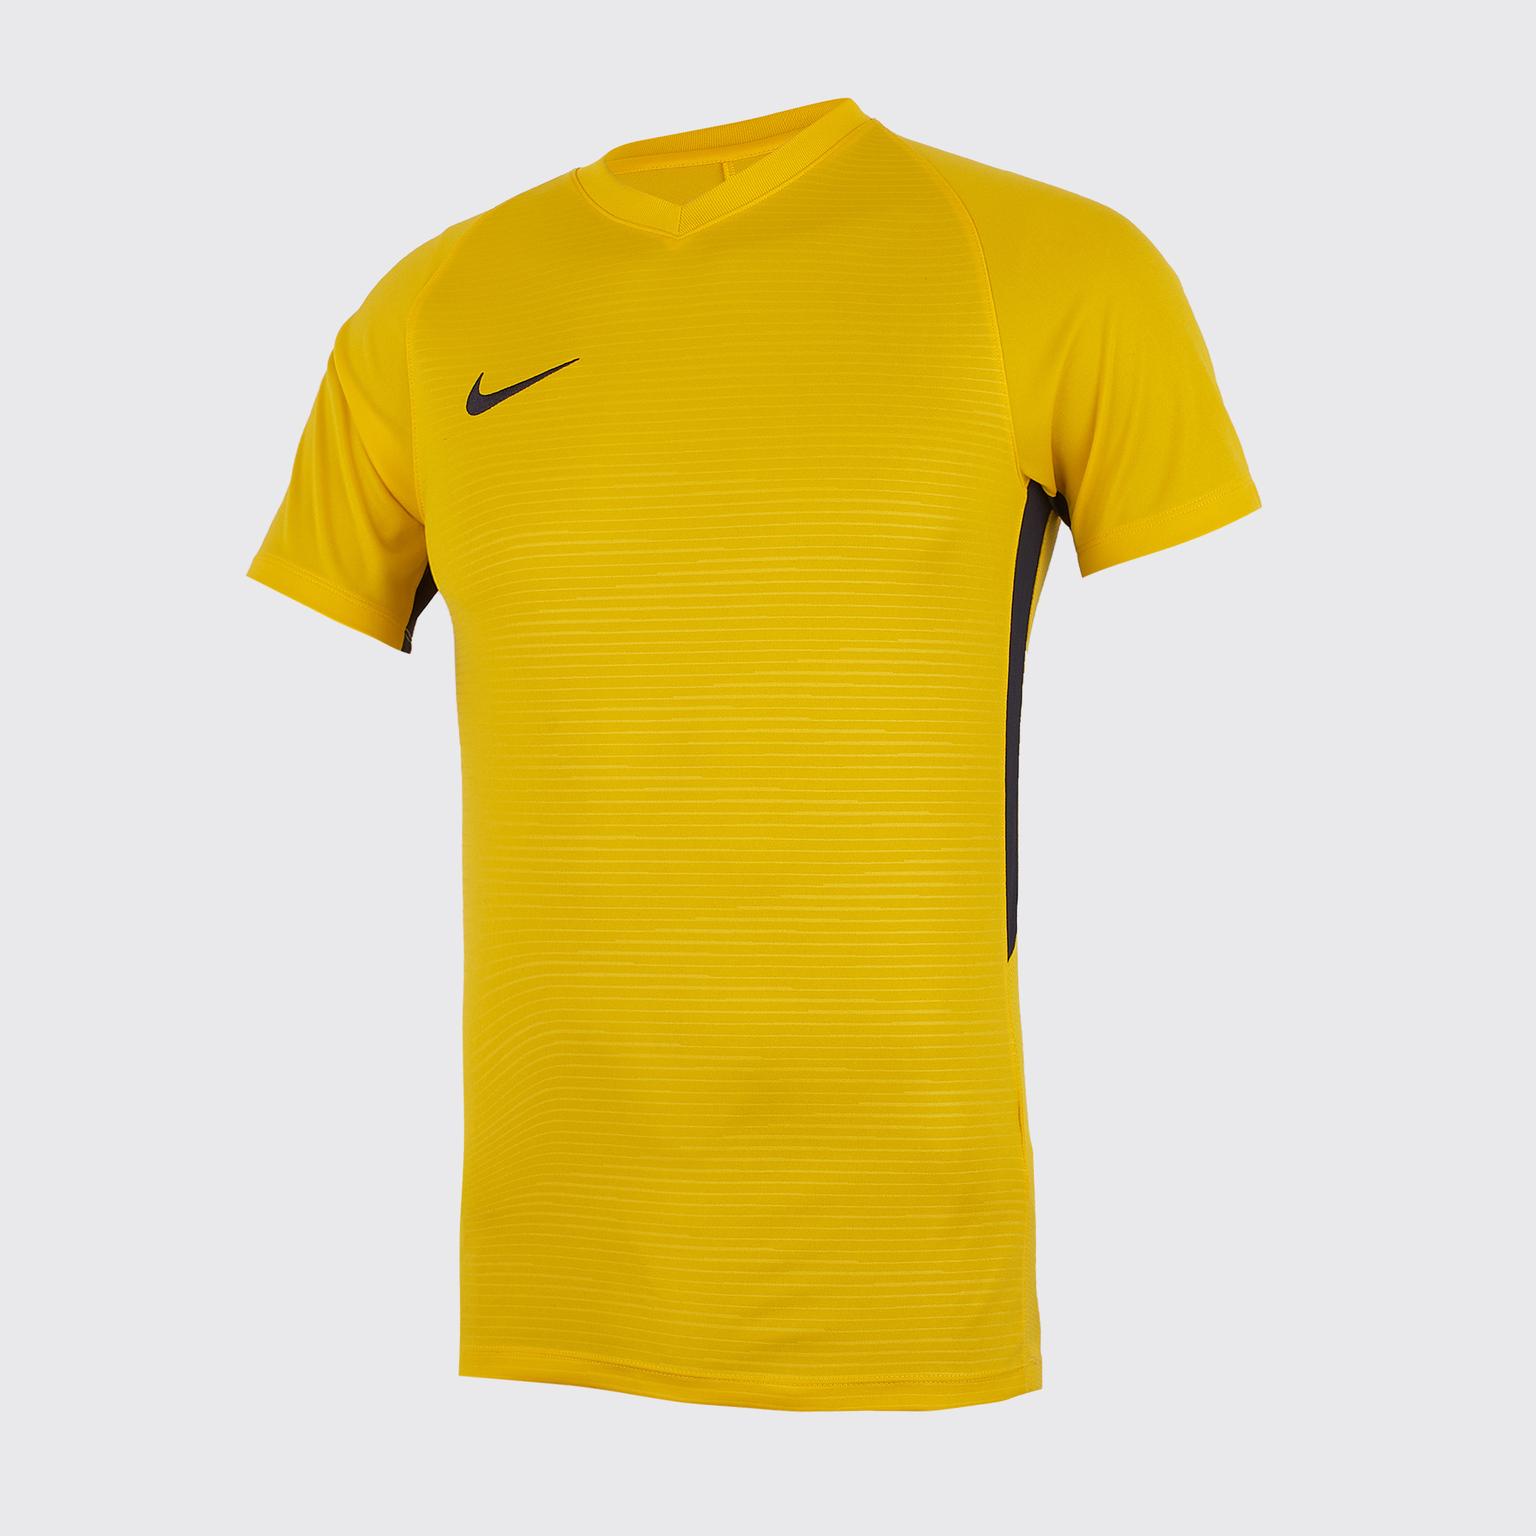 Футболка игровая Nike Dry Tiempo Prem JSY SS 894230-739 футболка игровая nike dry tiempo prem jsy ss 894230 662